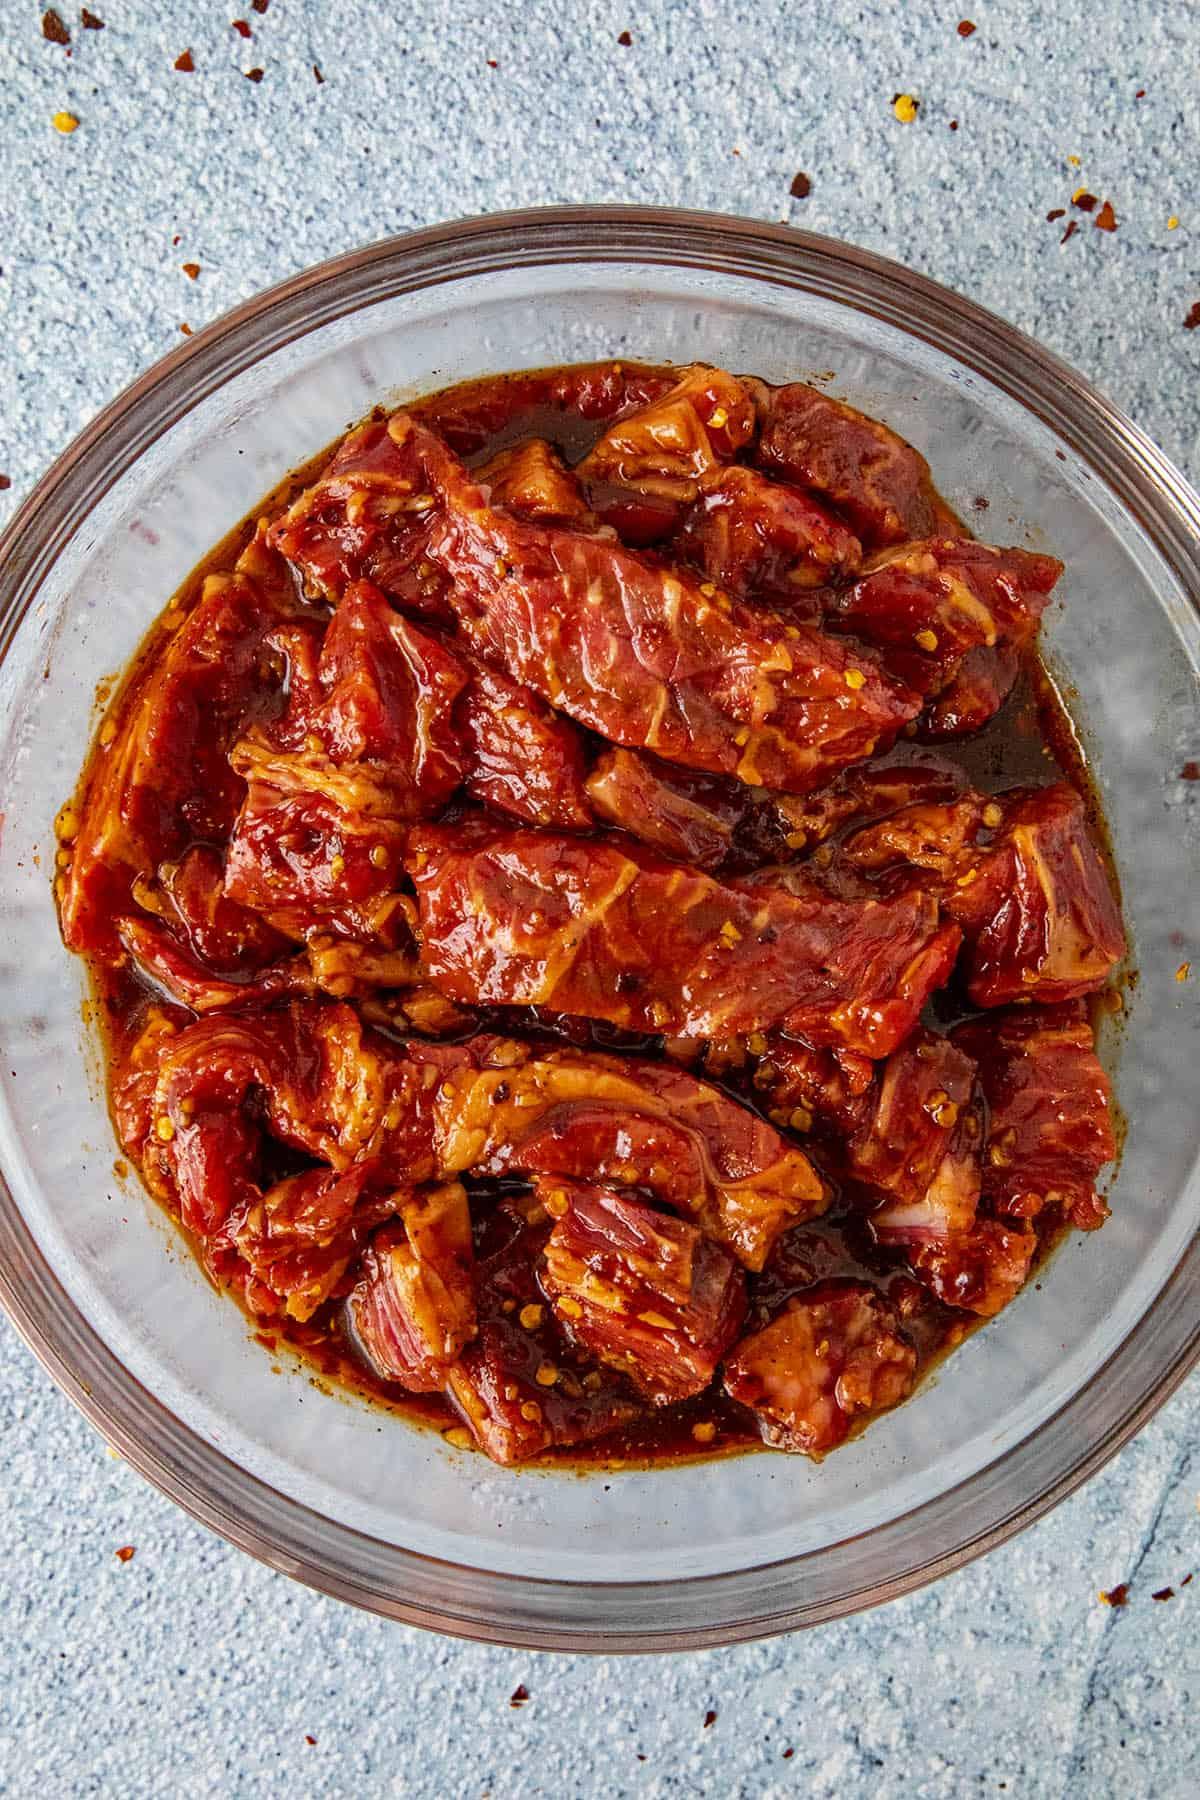 Sliced ribeye steak marinating in a bowl with bulgogi sauce